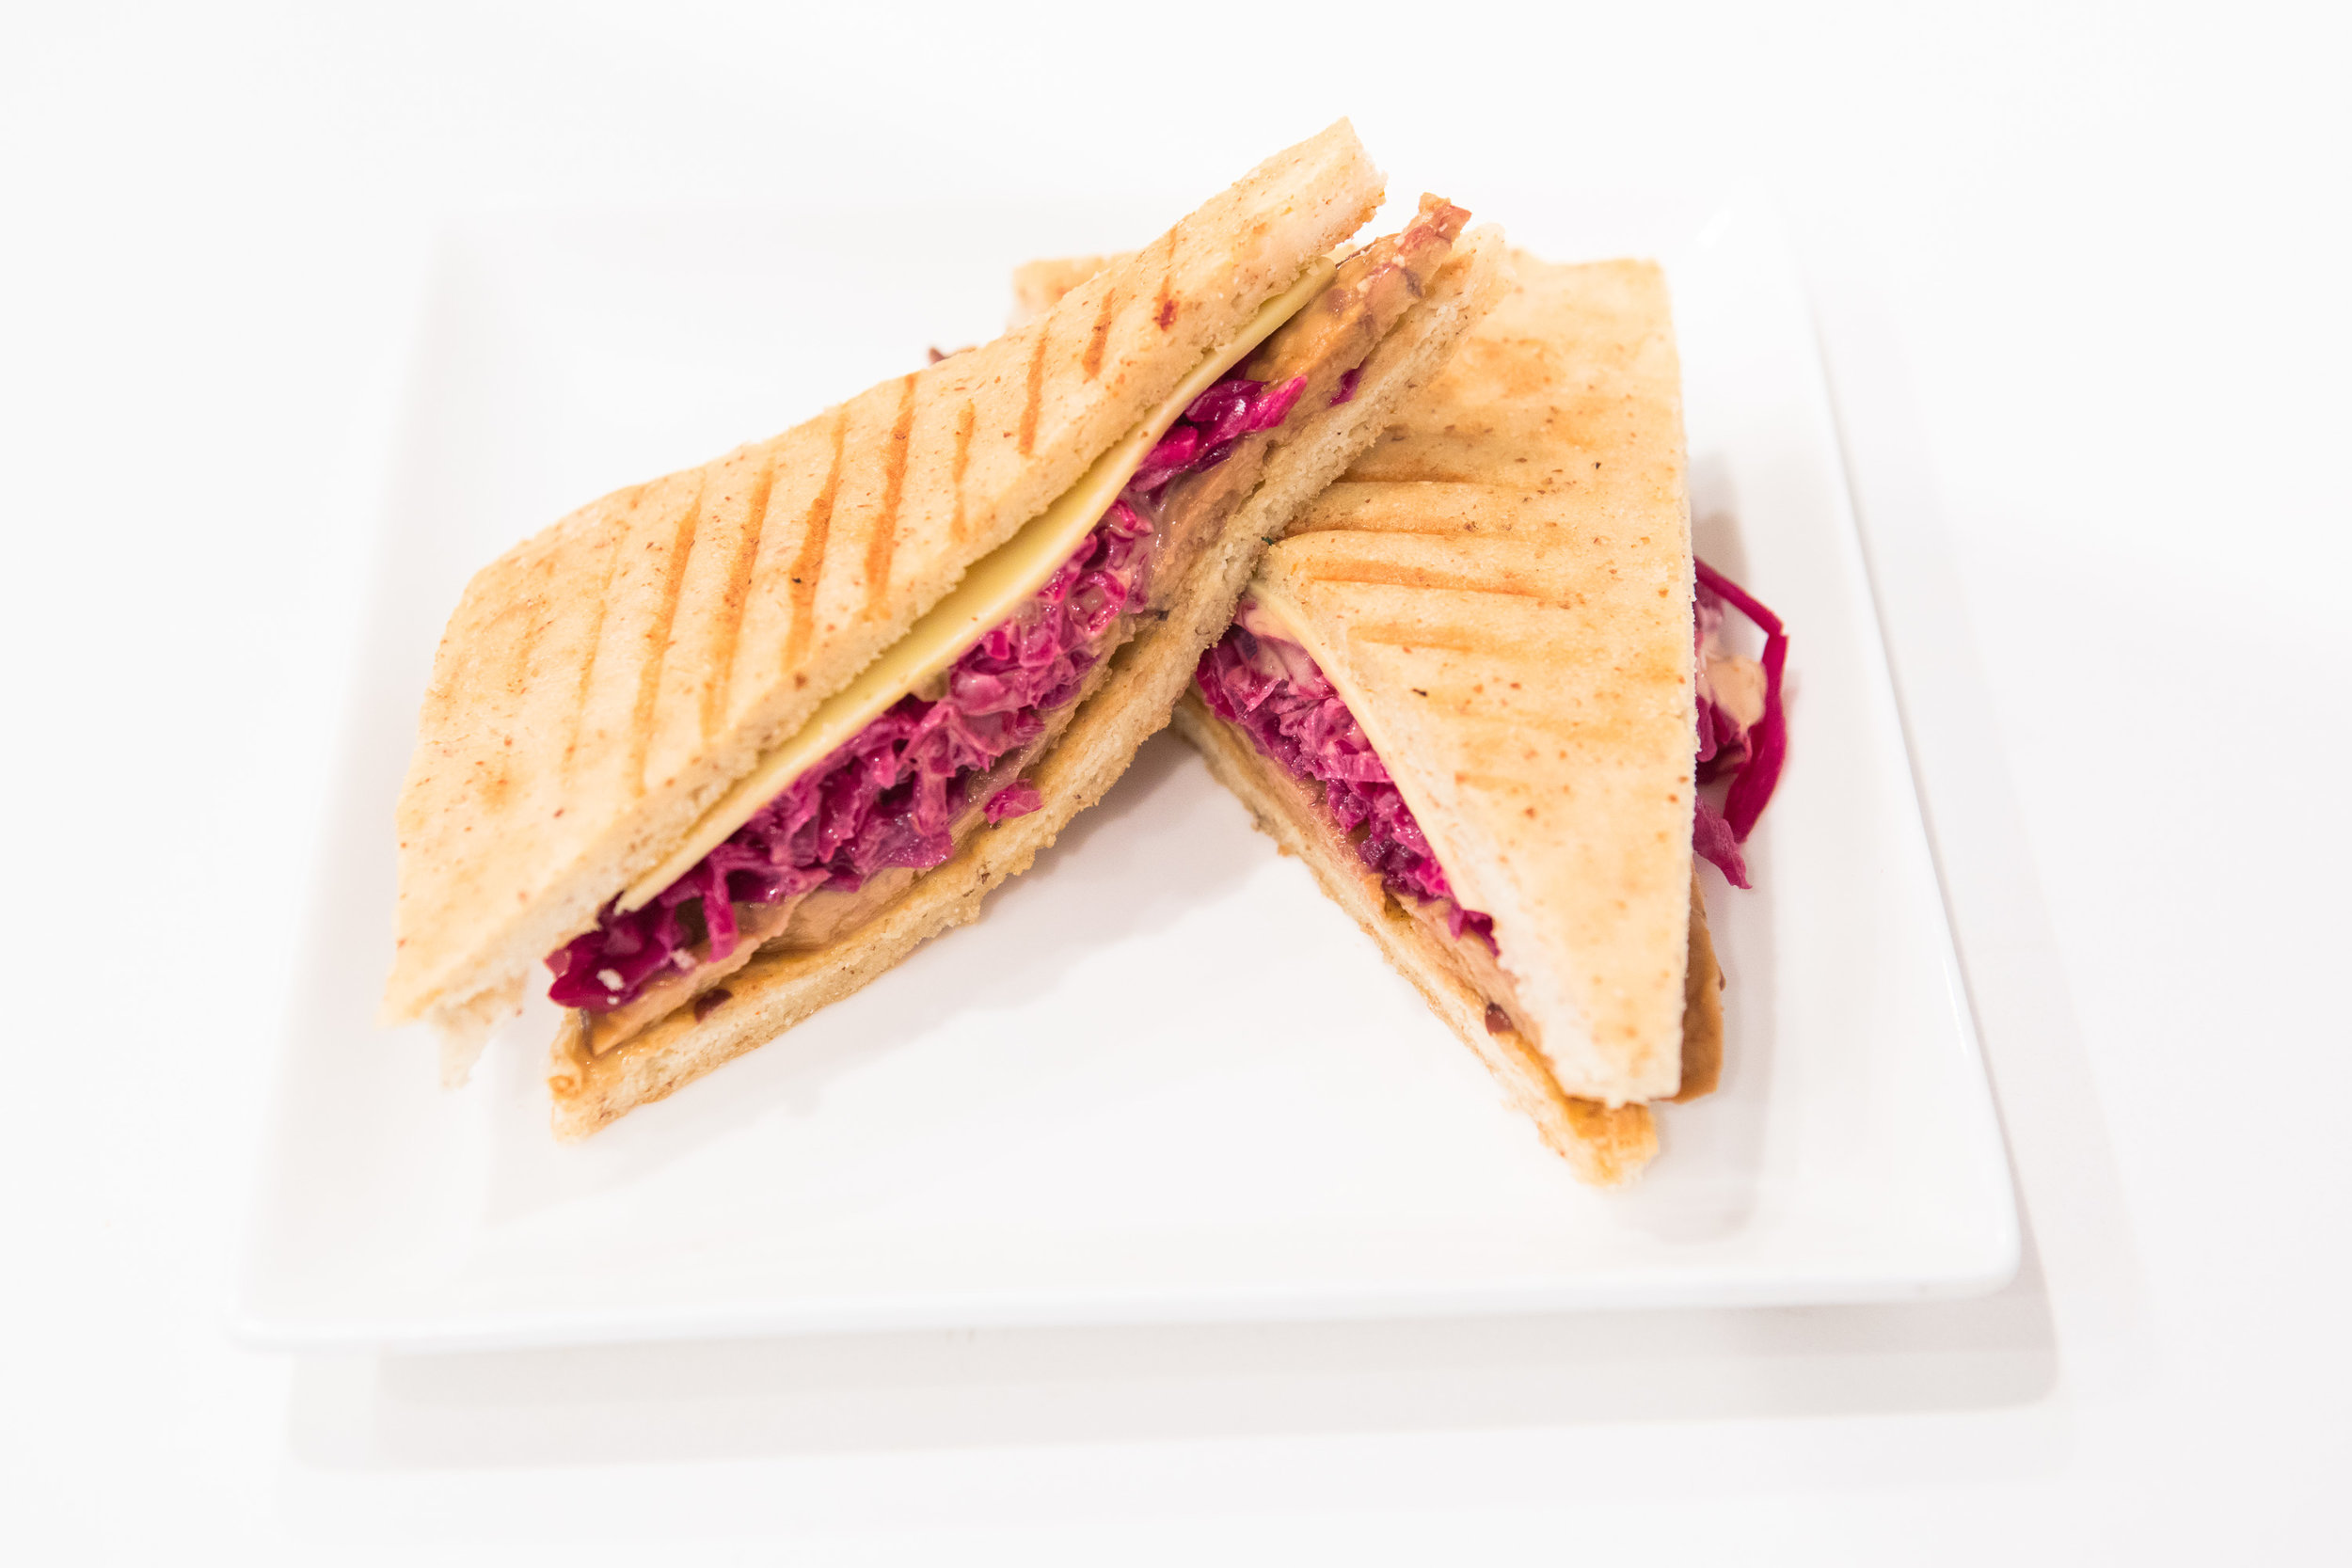 Maka-vegan-gluten-free-maui-cafe-ruben-1.jpg